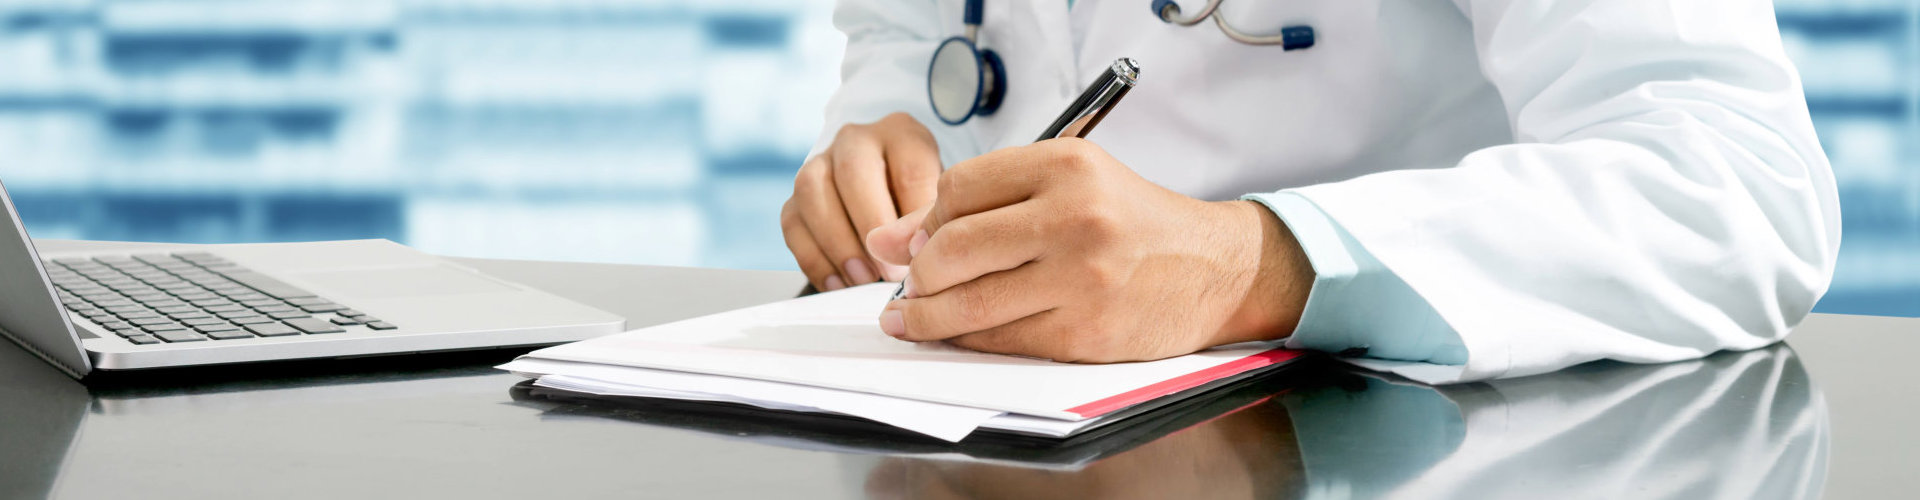 pharmacist writing a prescription